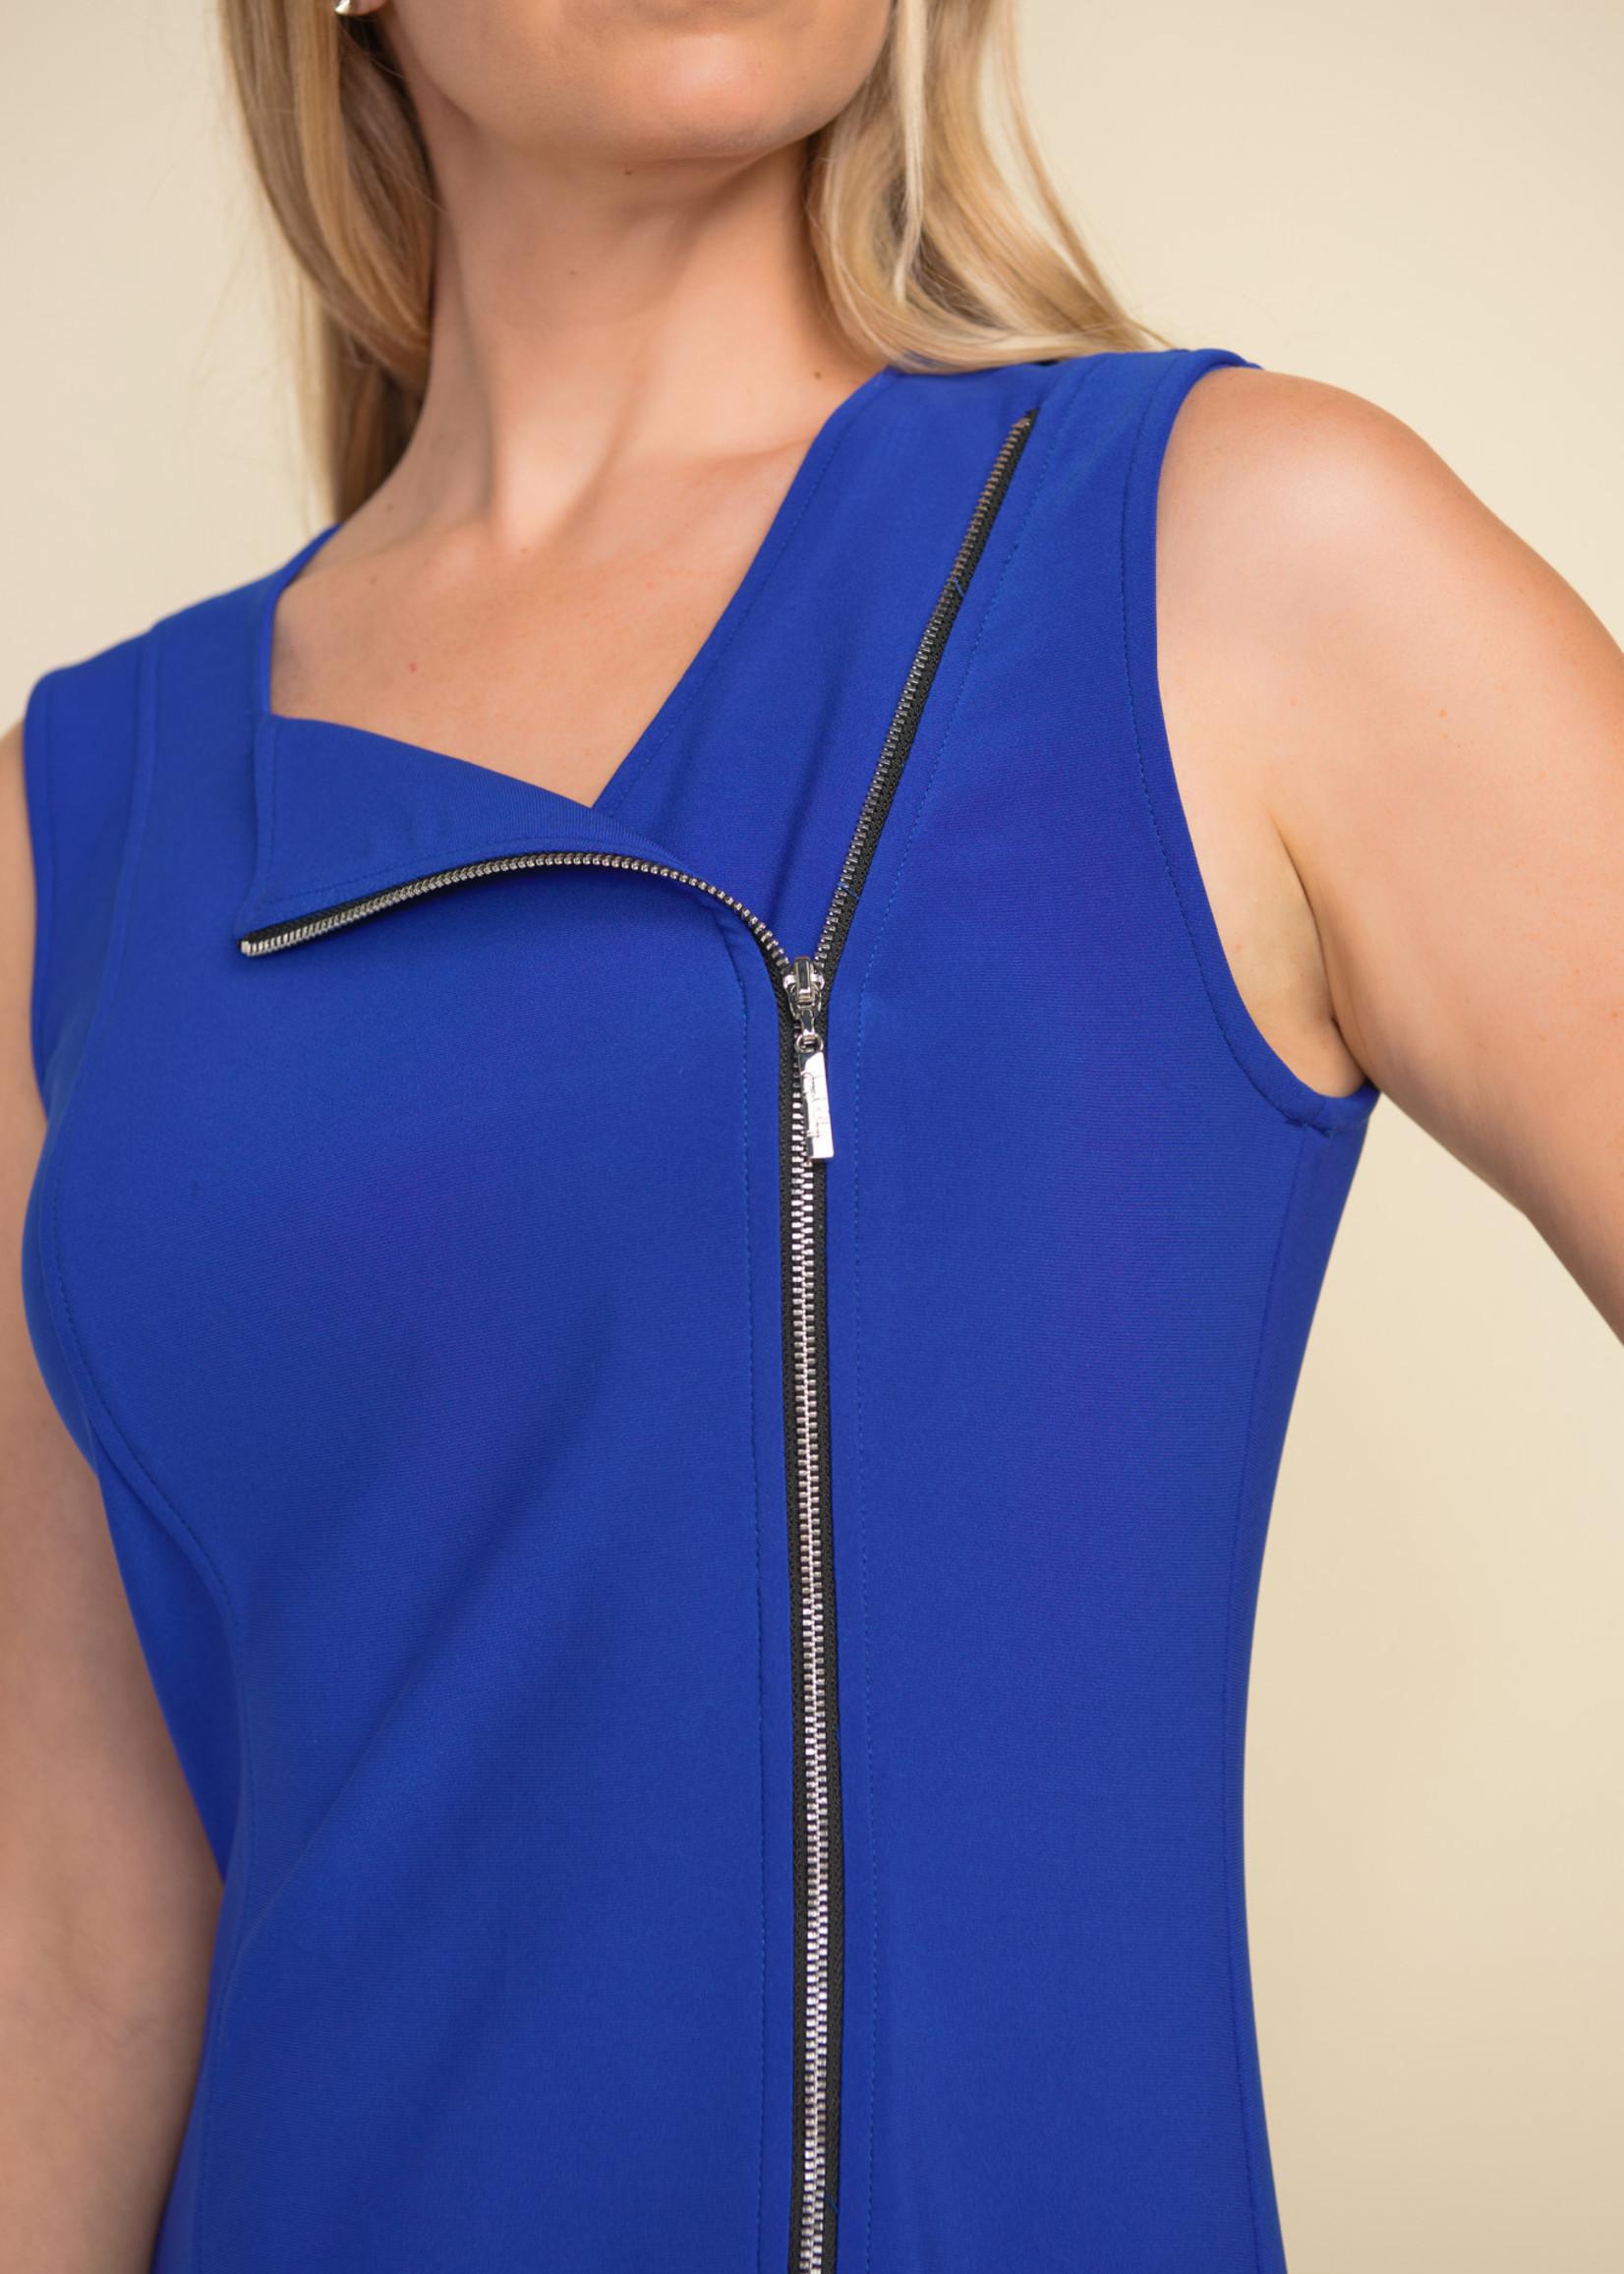 Joseph Ribkoff Joseph Ribkoff Side Zip Dress